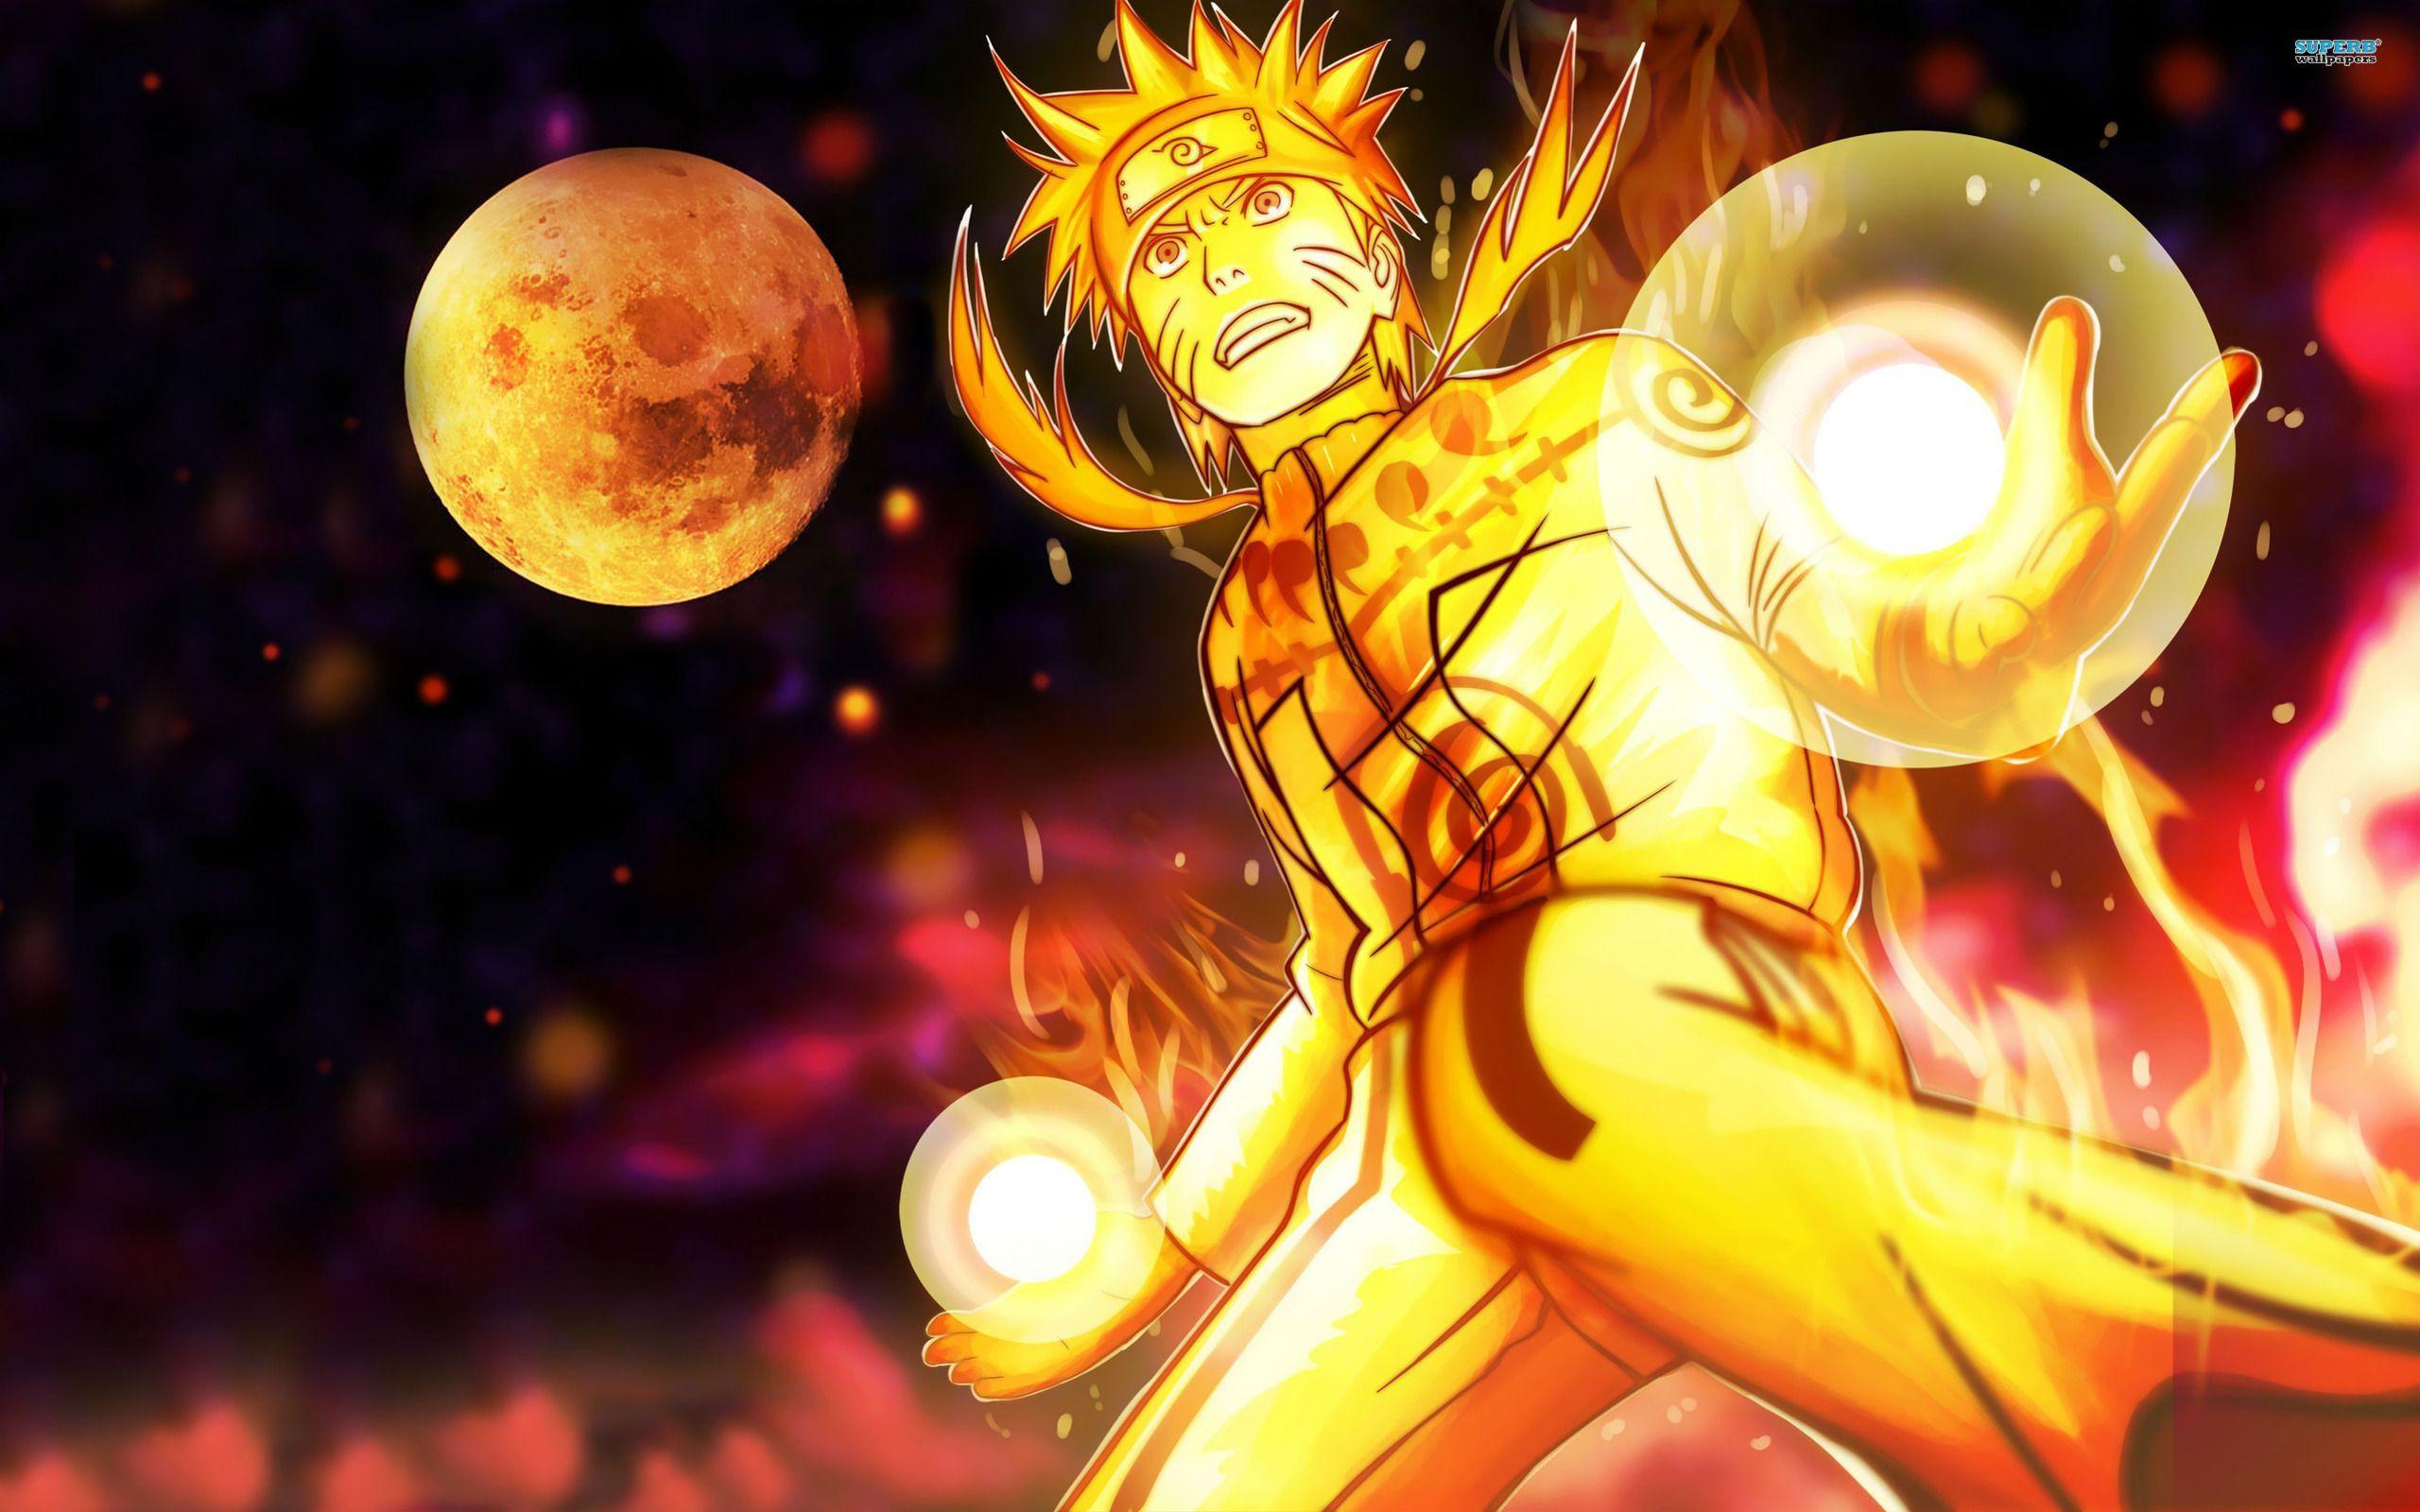 Naruto Shippuden Live Wallpaper